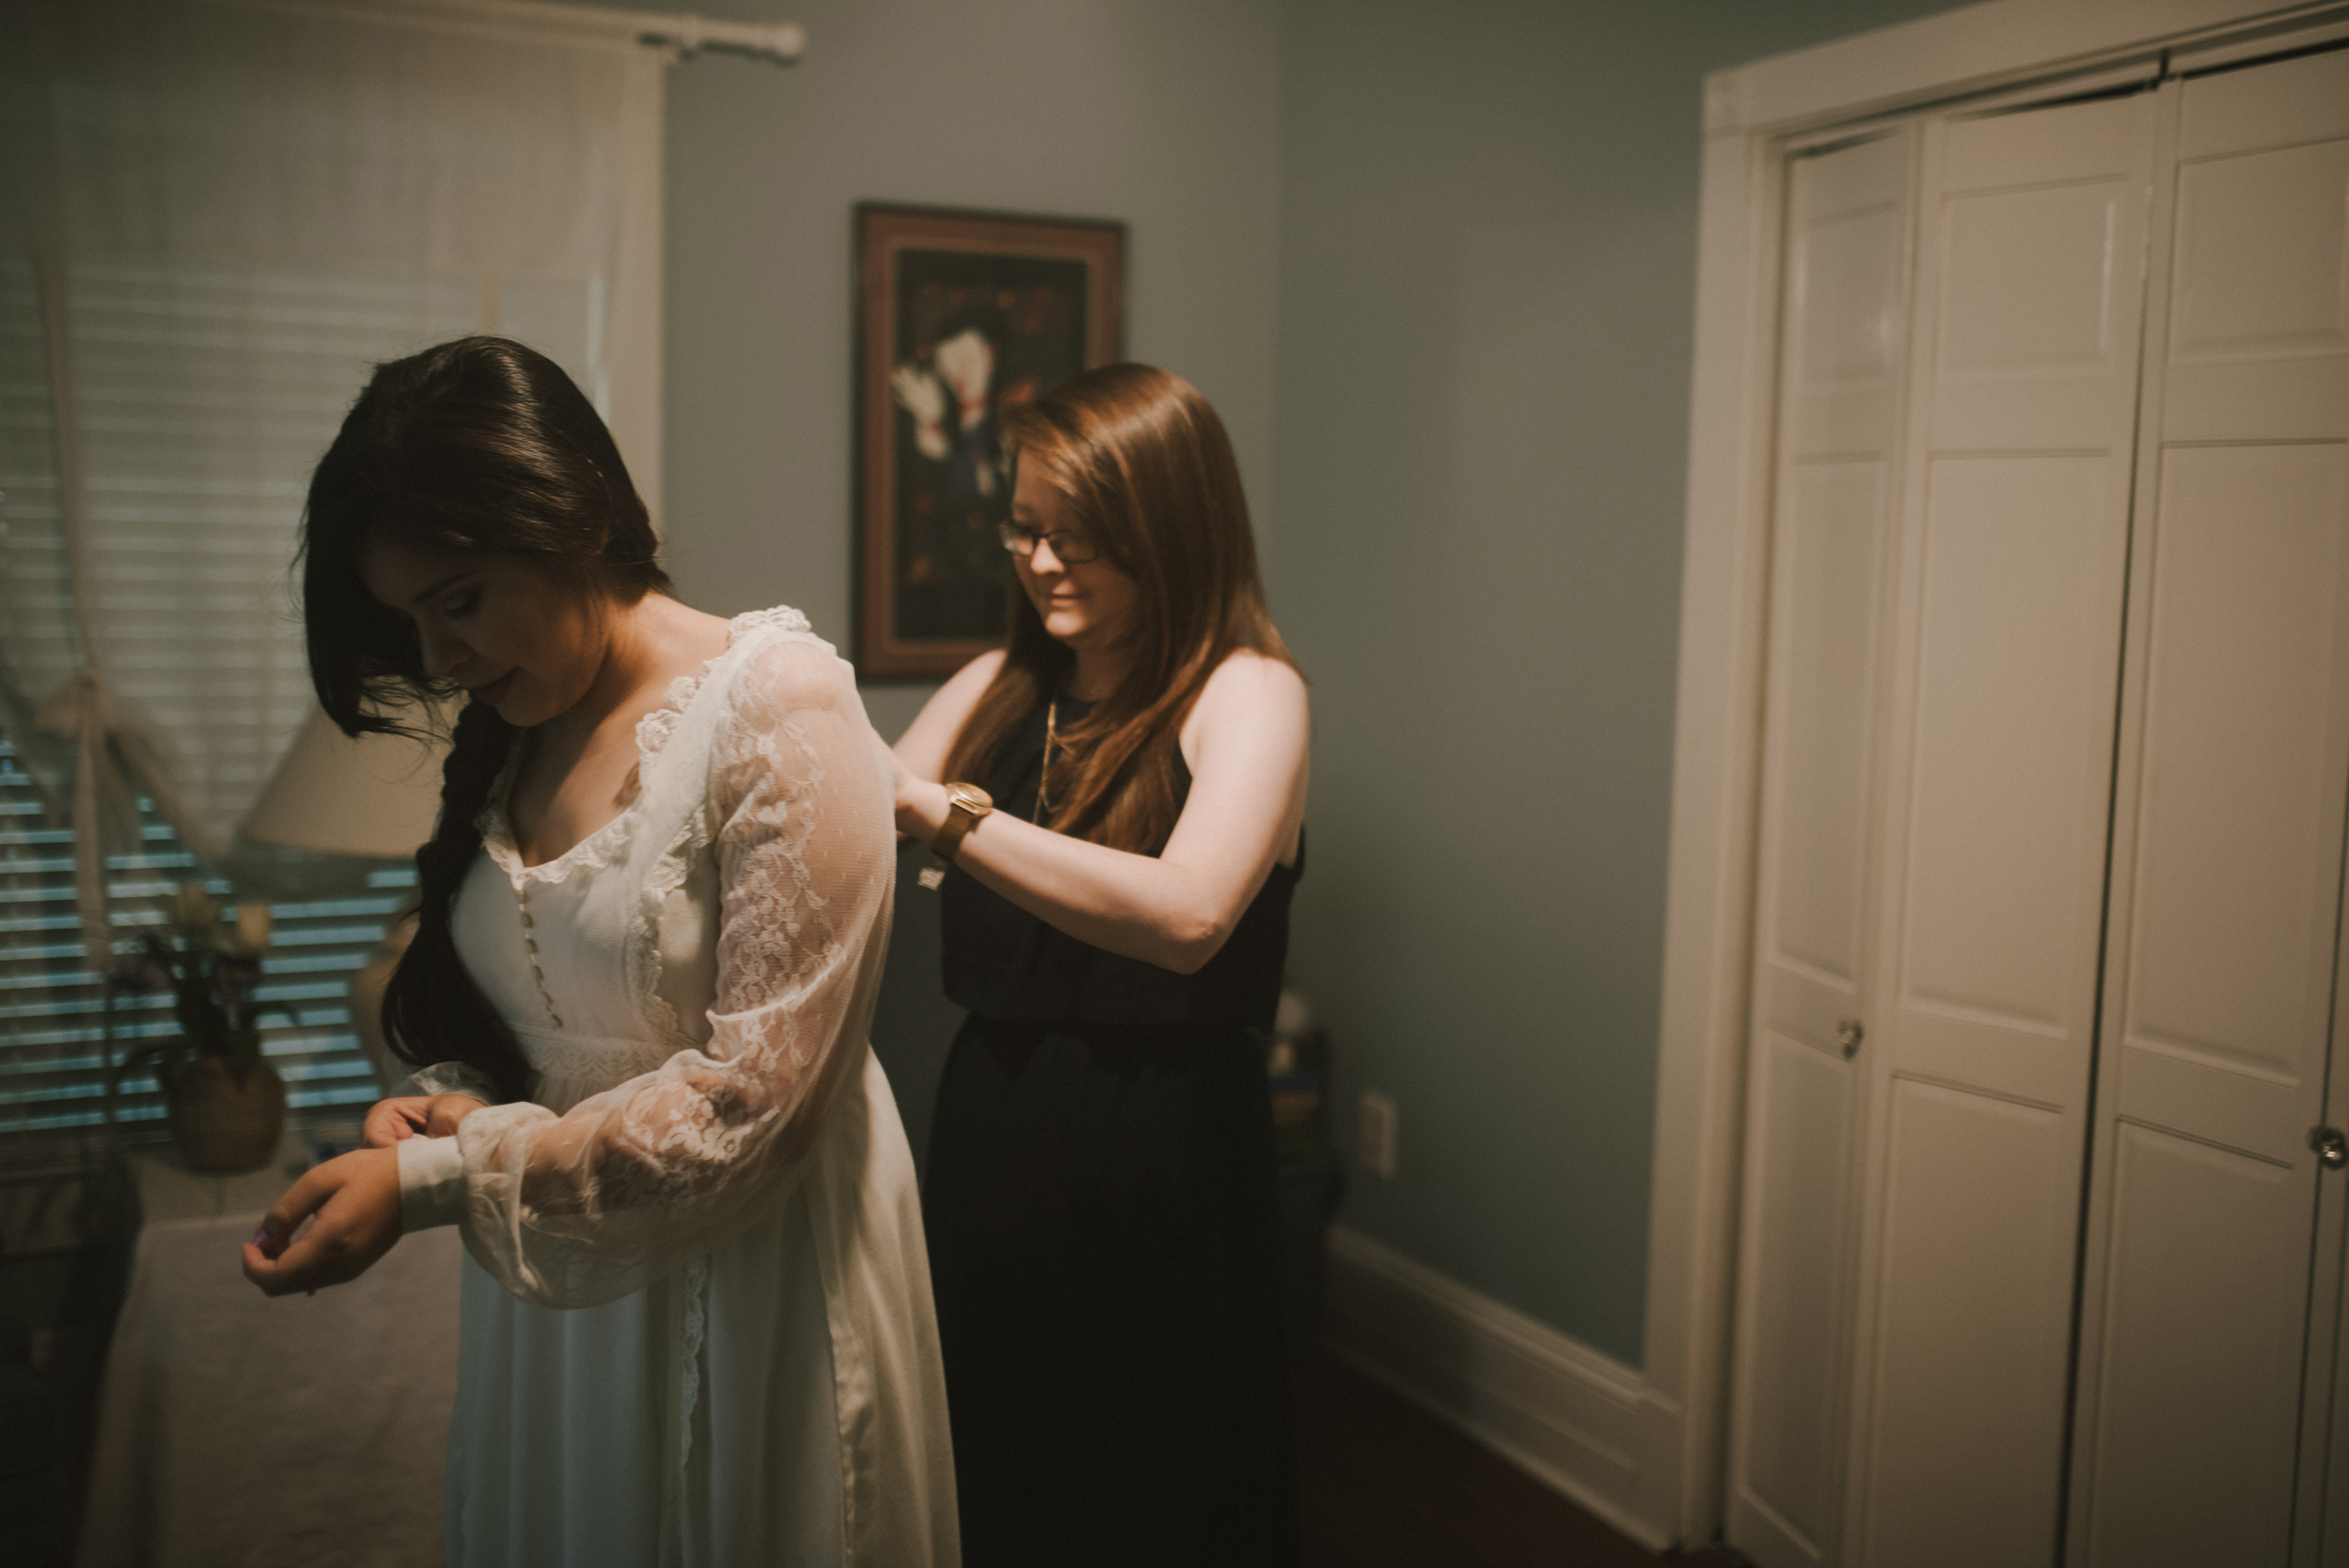 ofRen_weddingphotographer-61.jpg